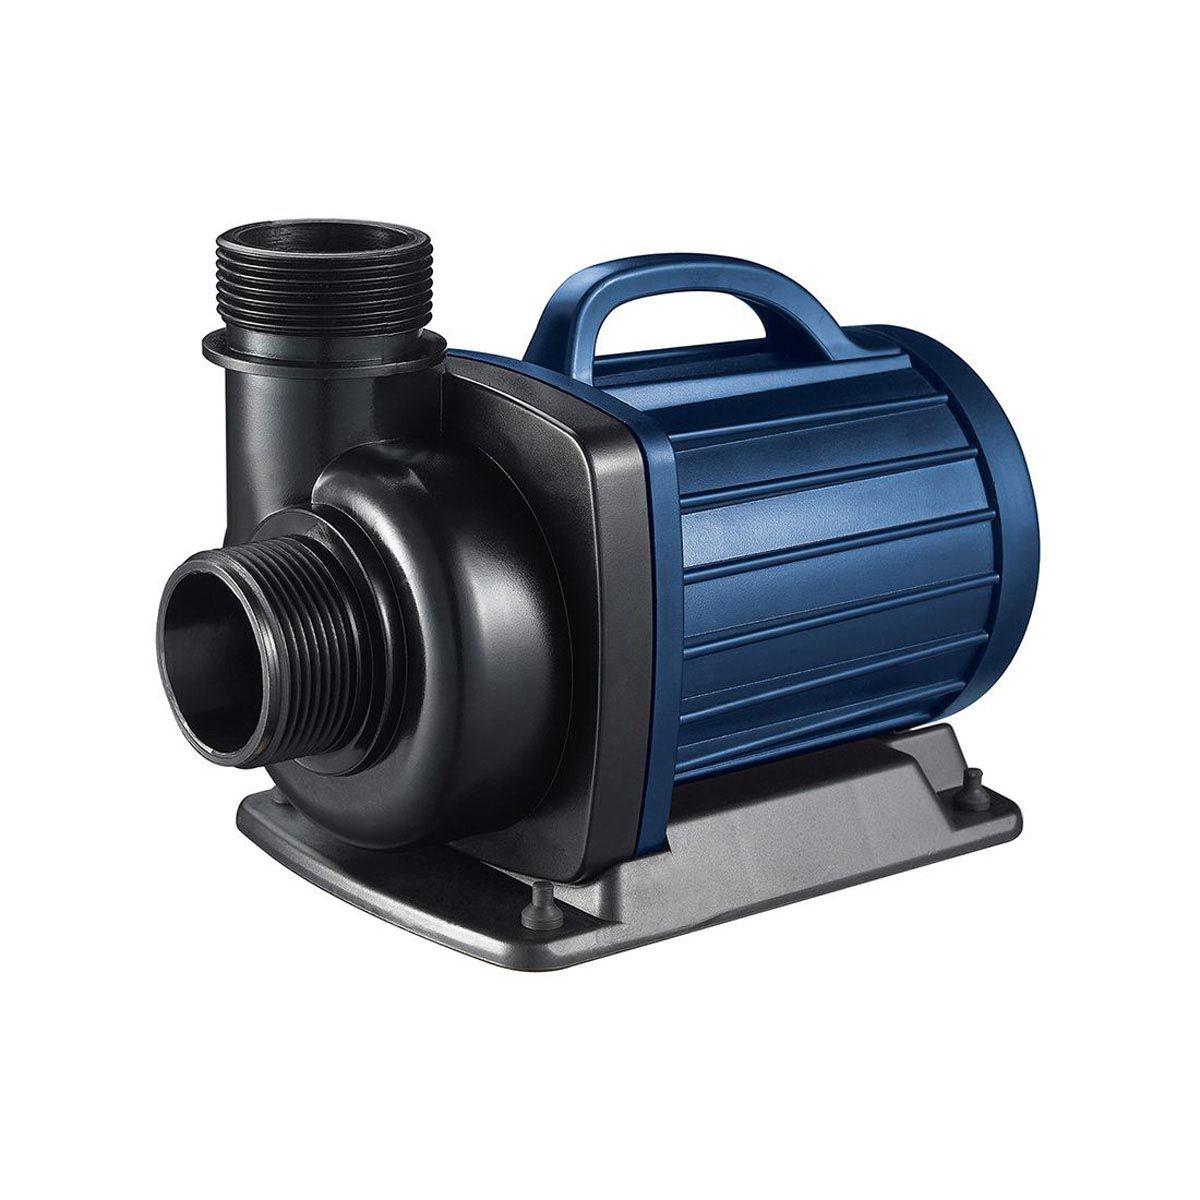 Teichpumpe LV 5000 12 Volt